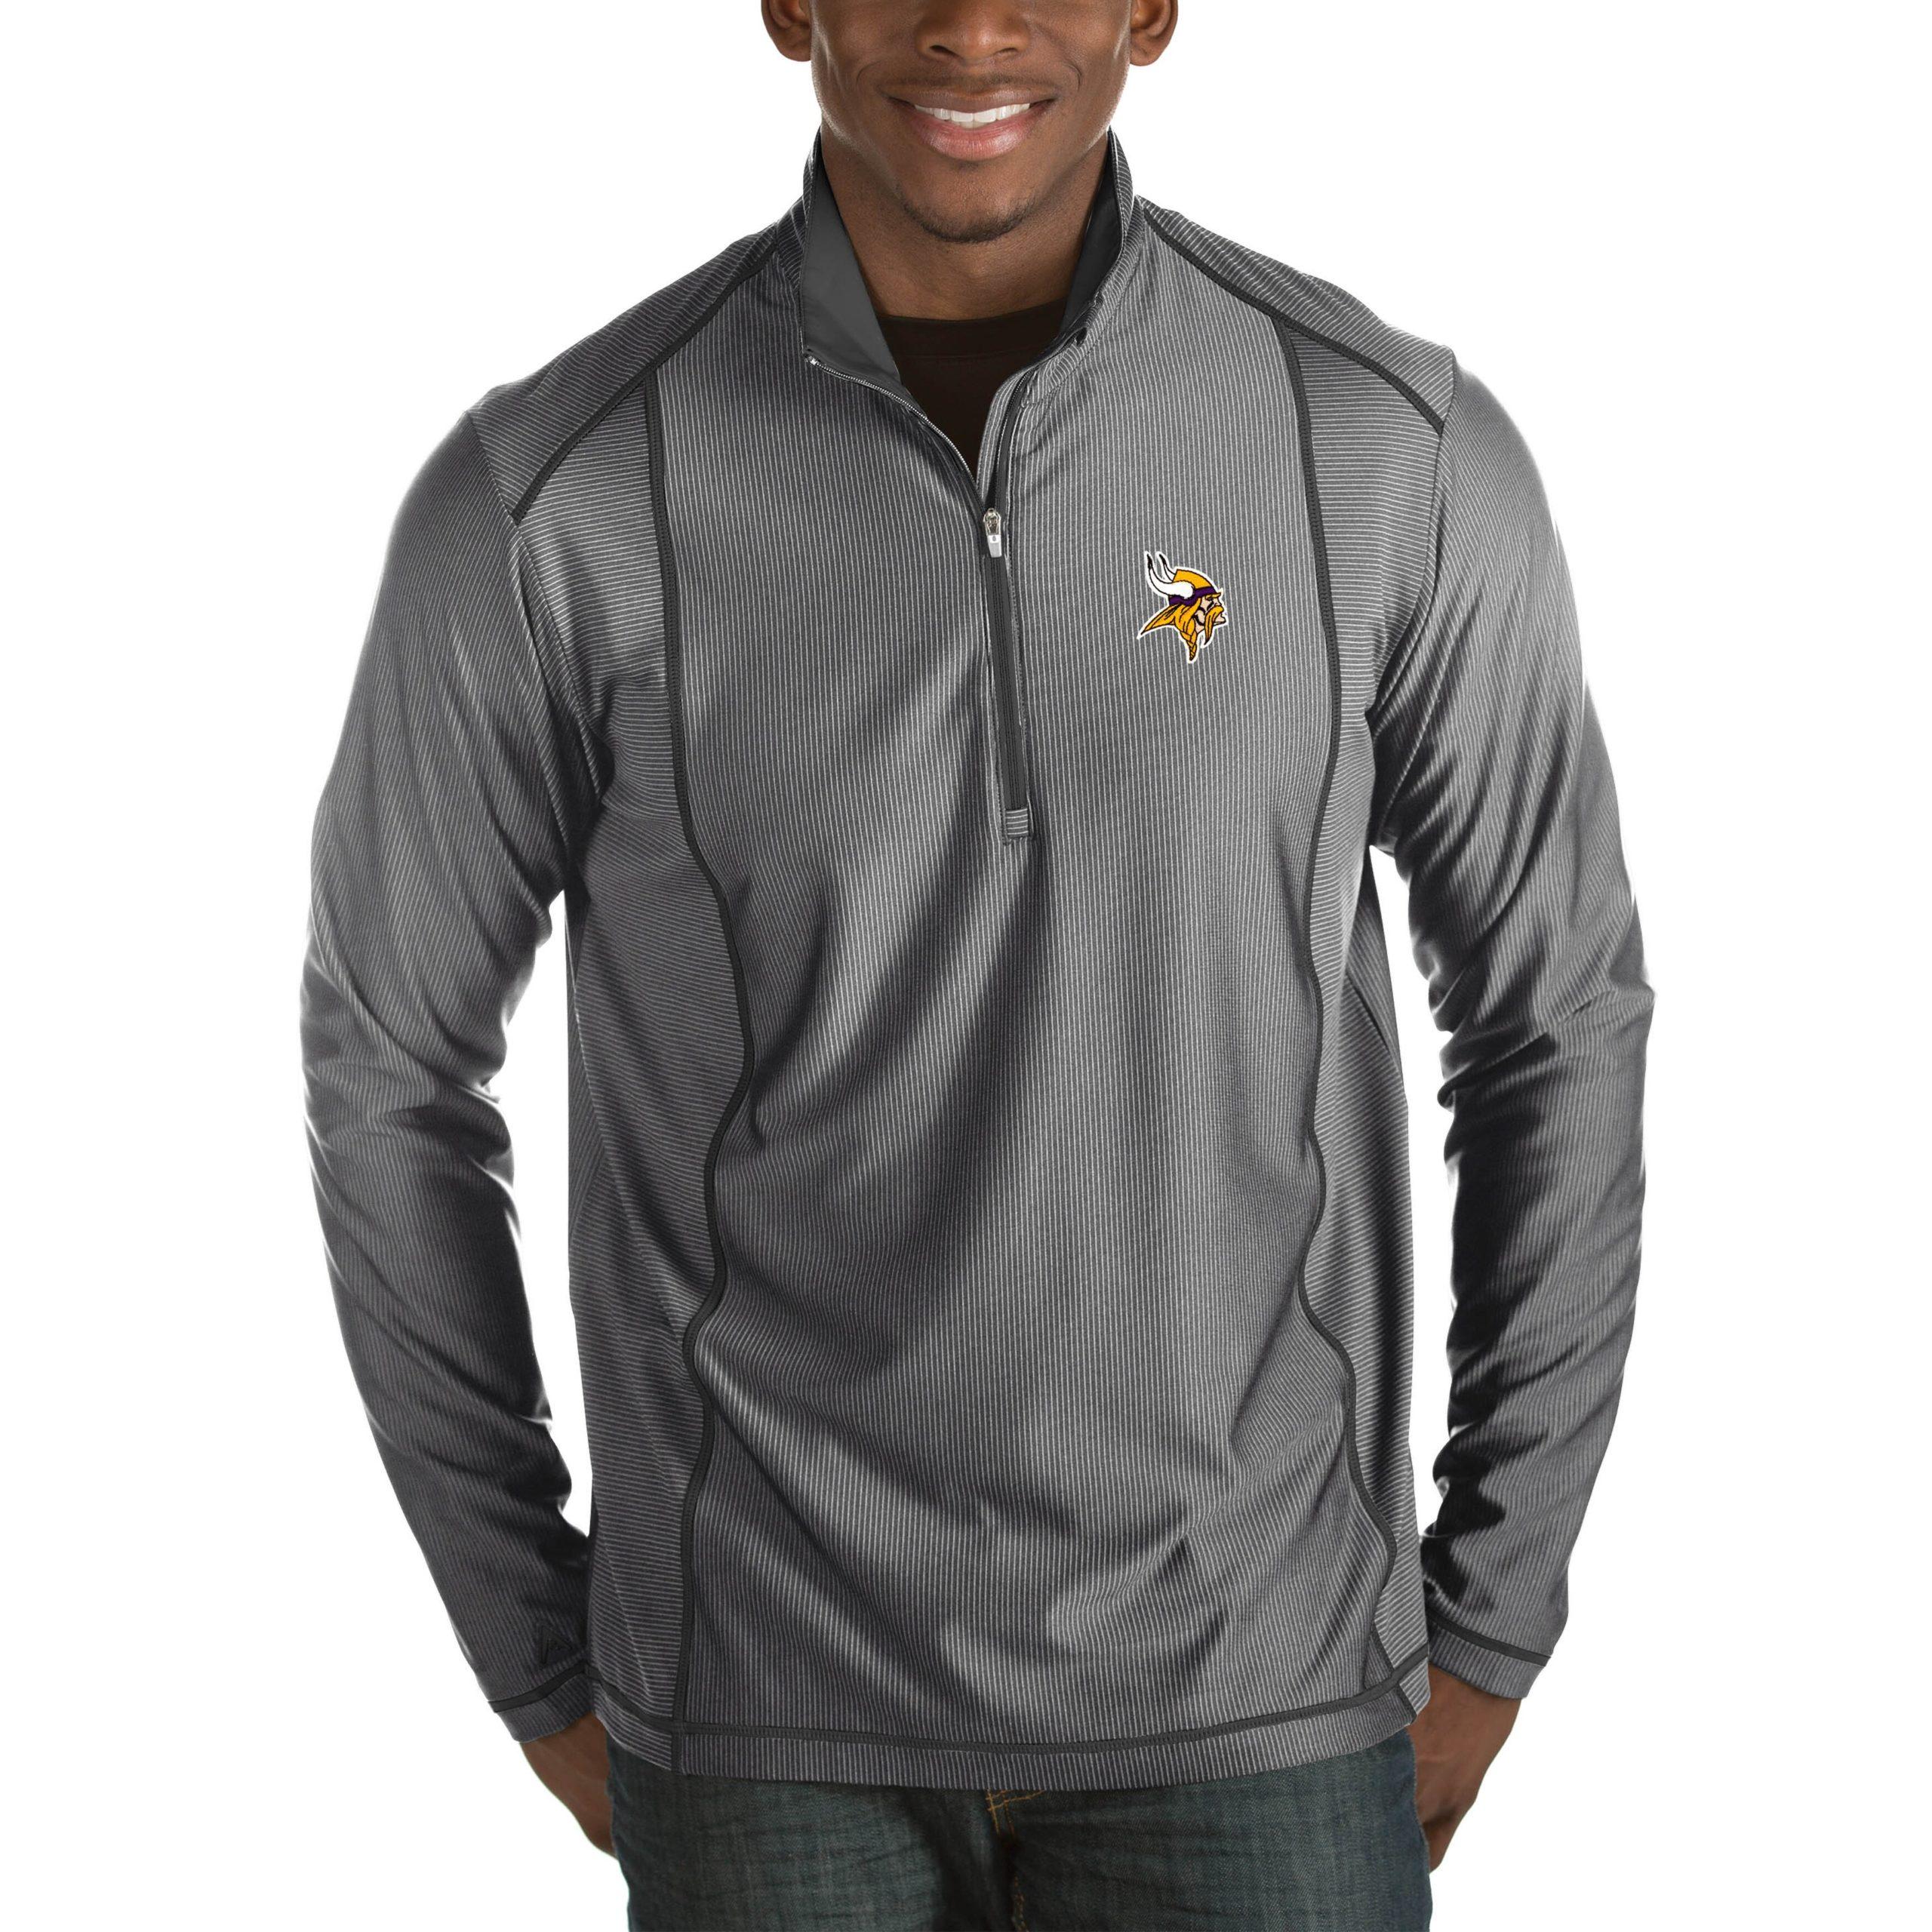 Minnesota Vikings Antigua Tempo Big & Tall Half-Zip Pullover Jacket - Heather Charcoal